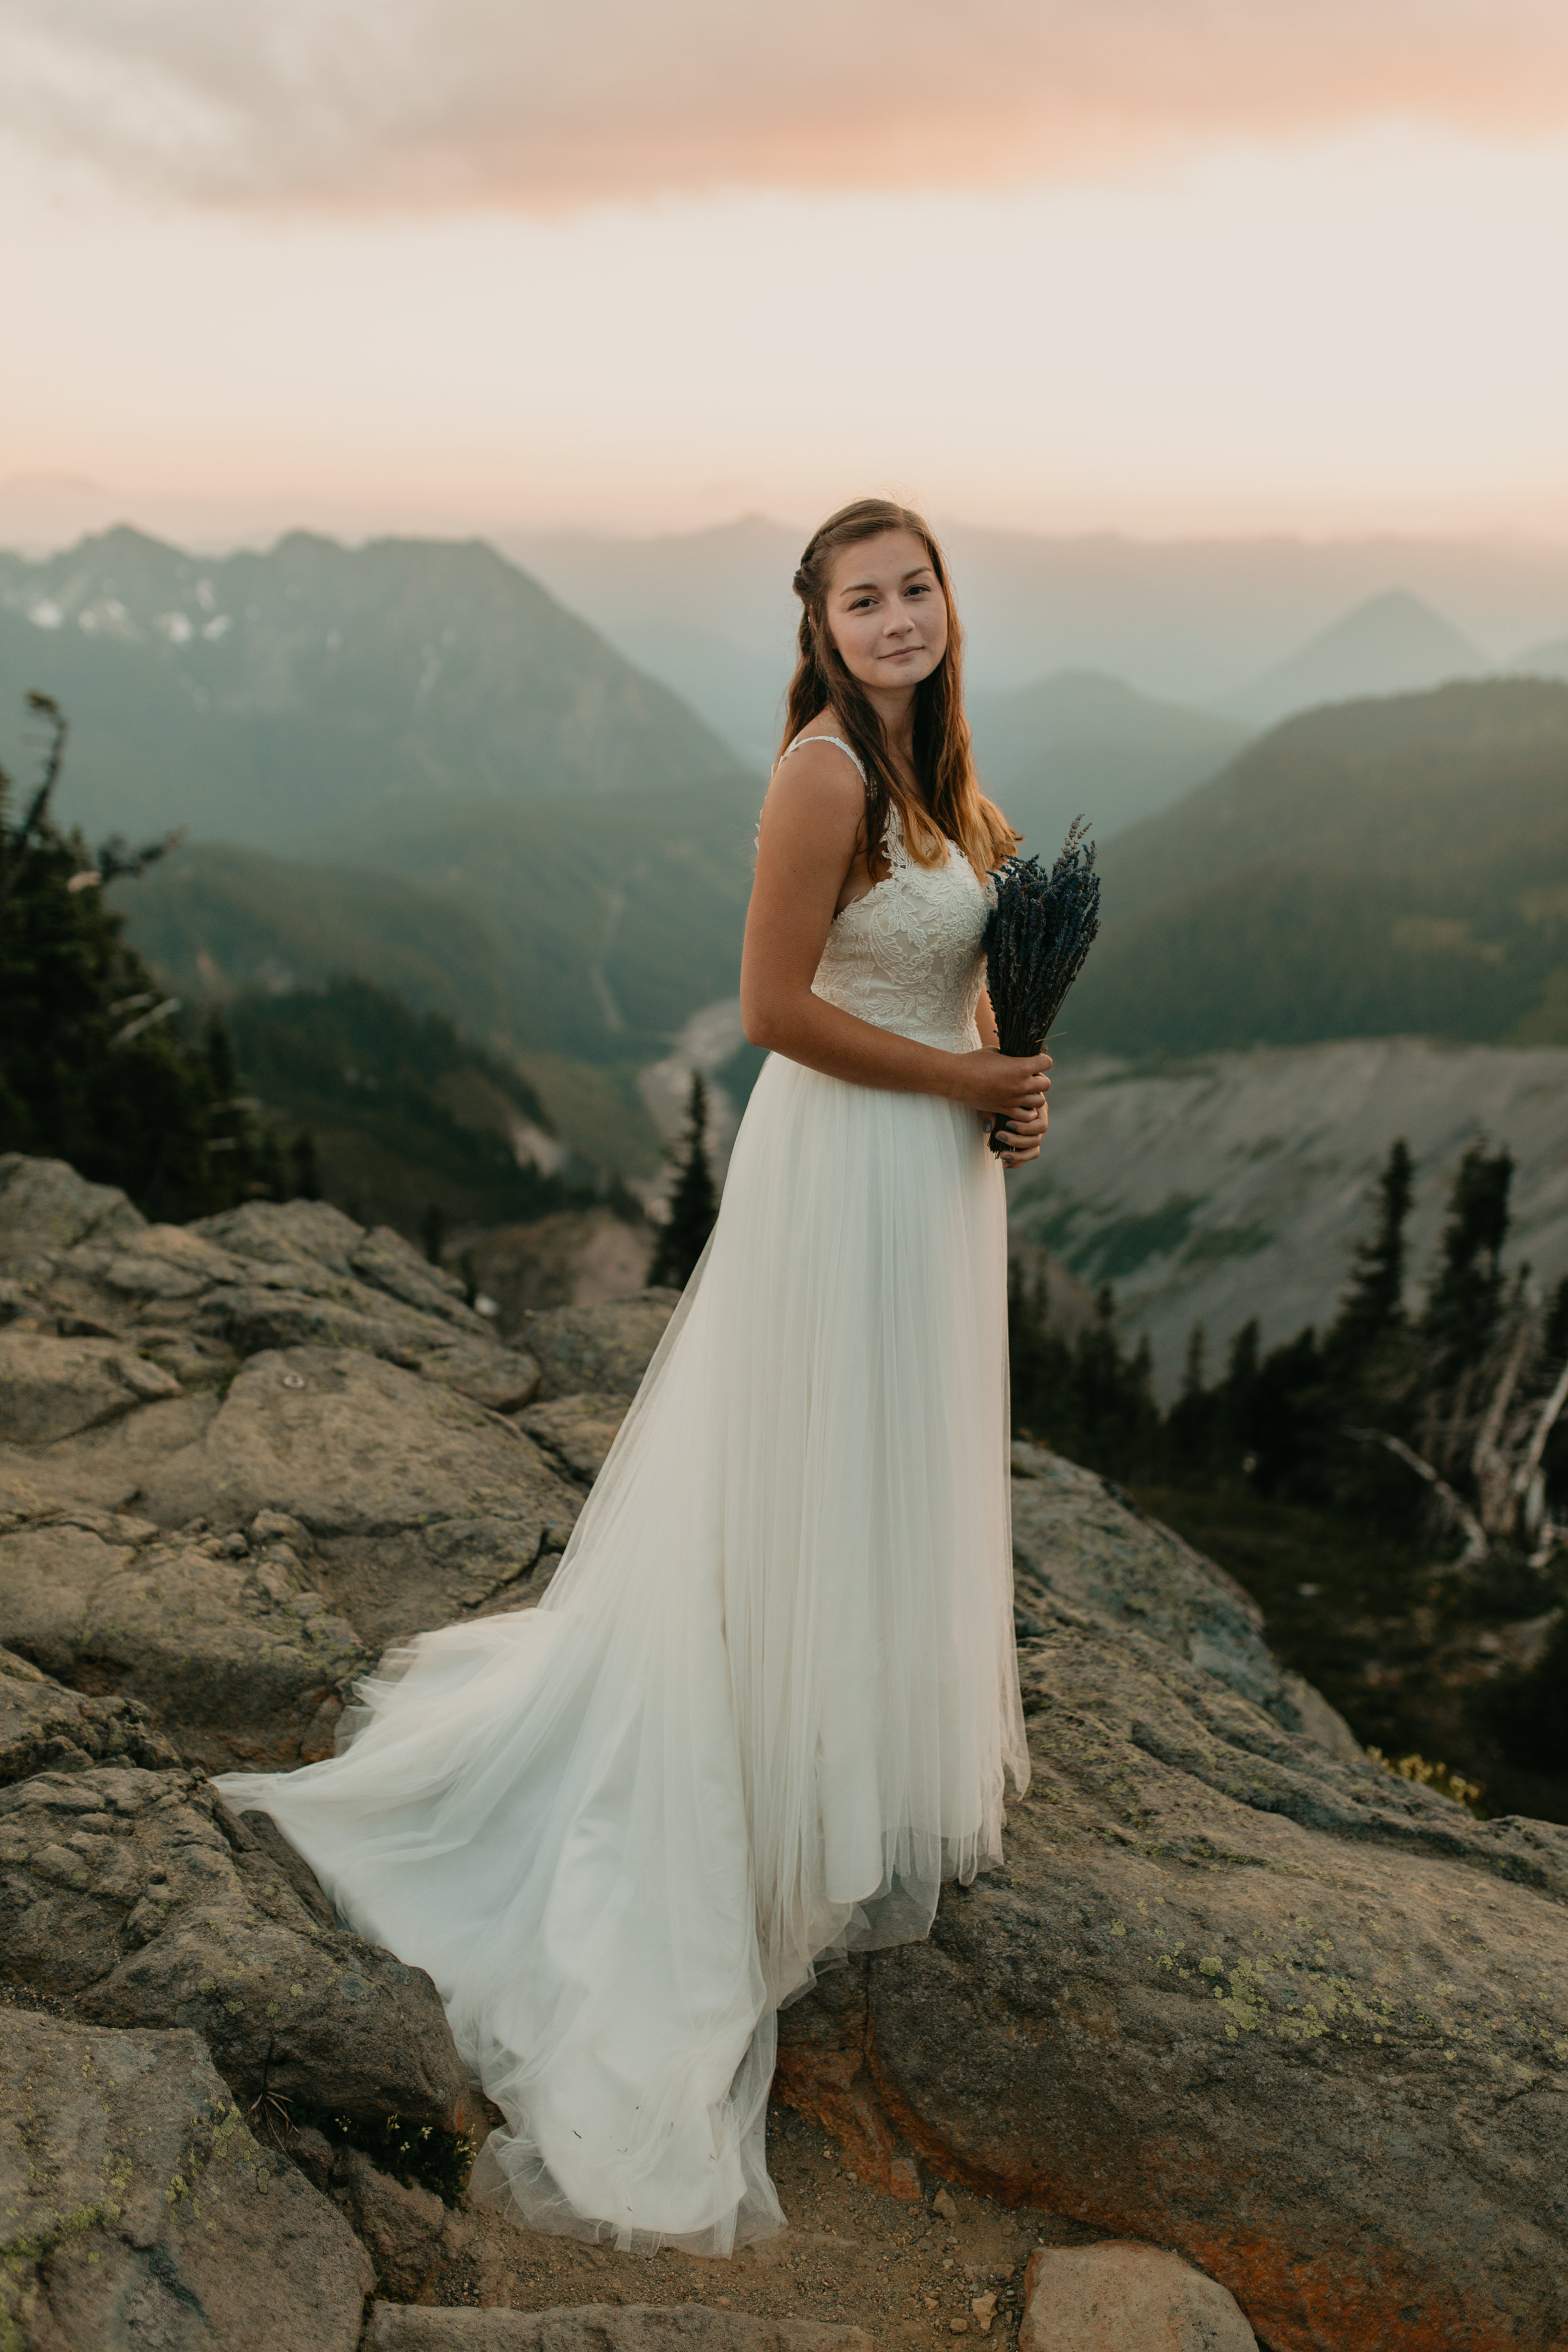 Nicole-Daacke-Photography-Mt-Rainier-elopement-photographer-washington-mountain-epic-wedding-photography-wildflowers-at-rainier-pine-tree-cloudy-summer-day-at-mountain-rainier-52.jpg